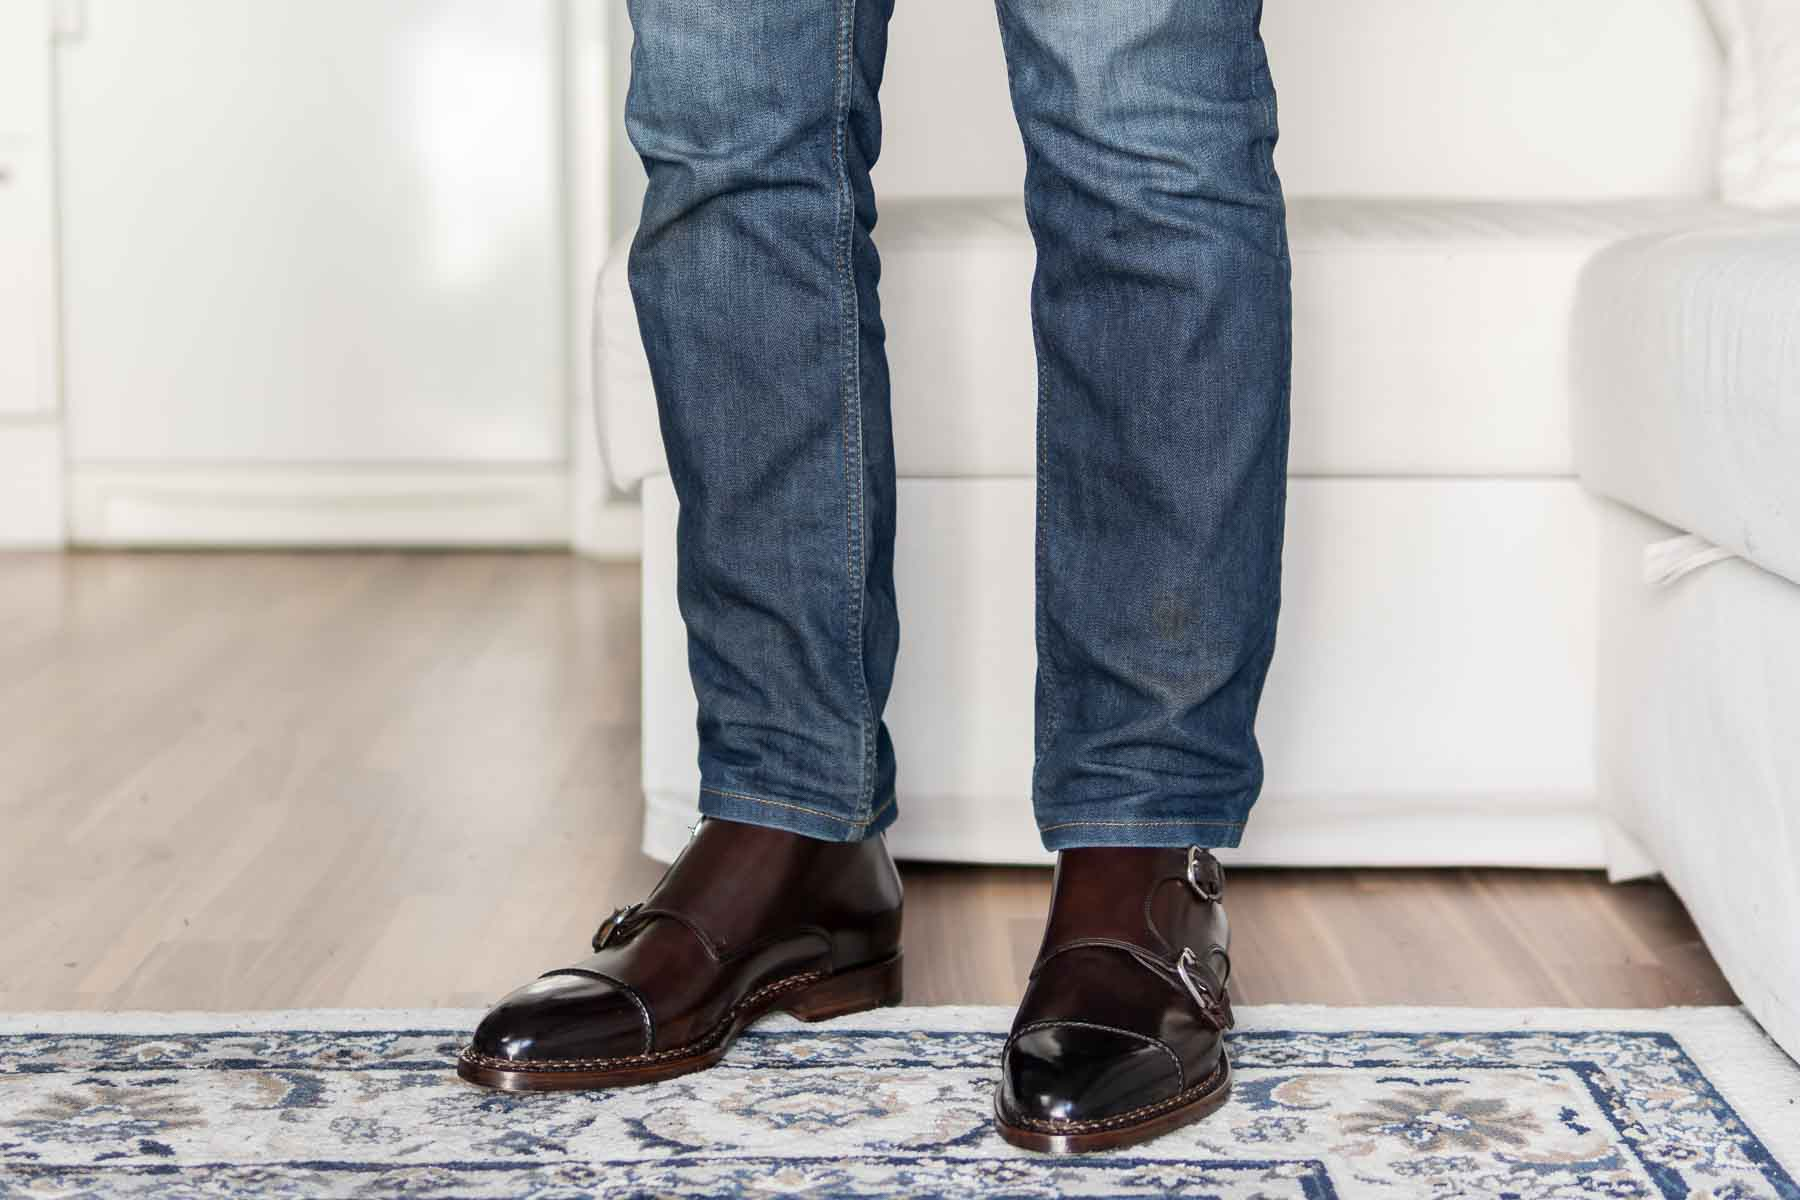 Paolo Scafora Double Monk Boots Review